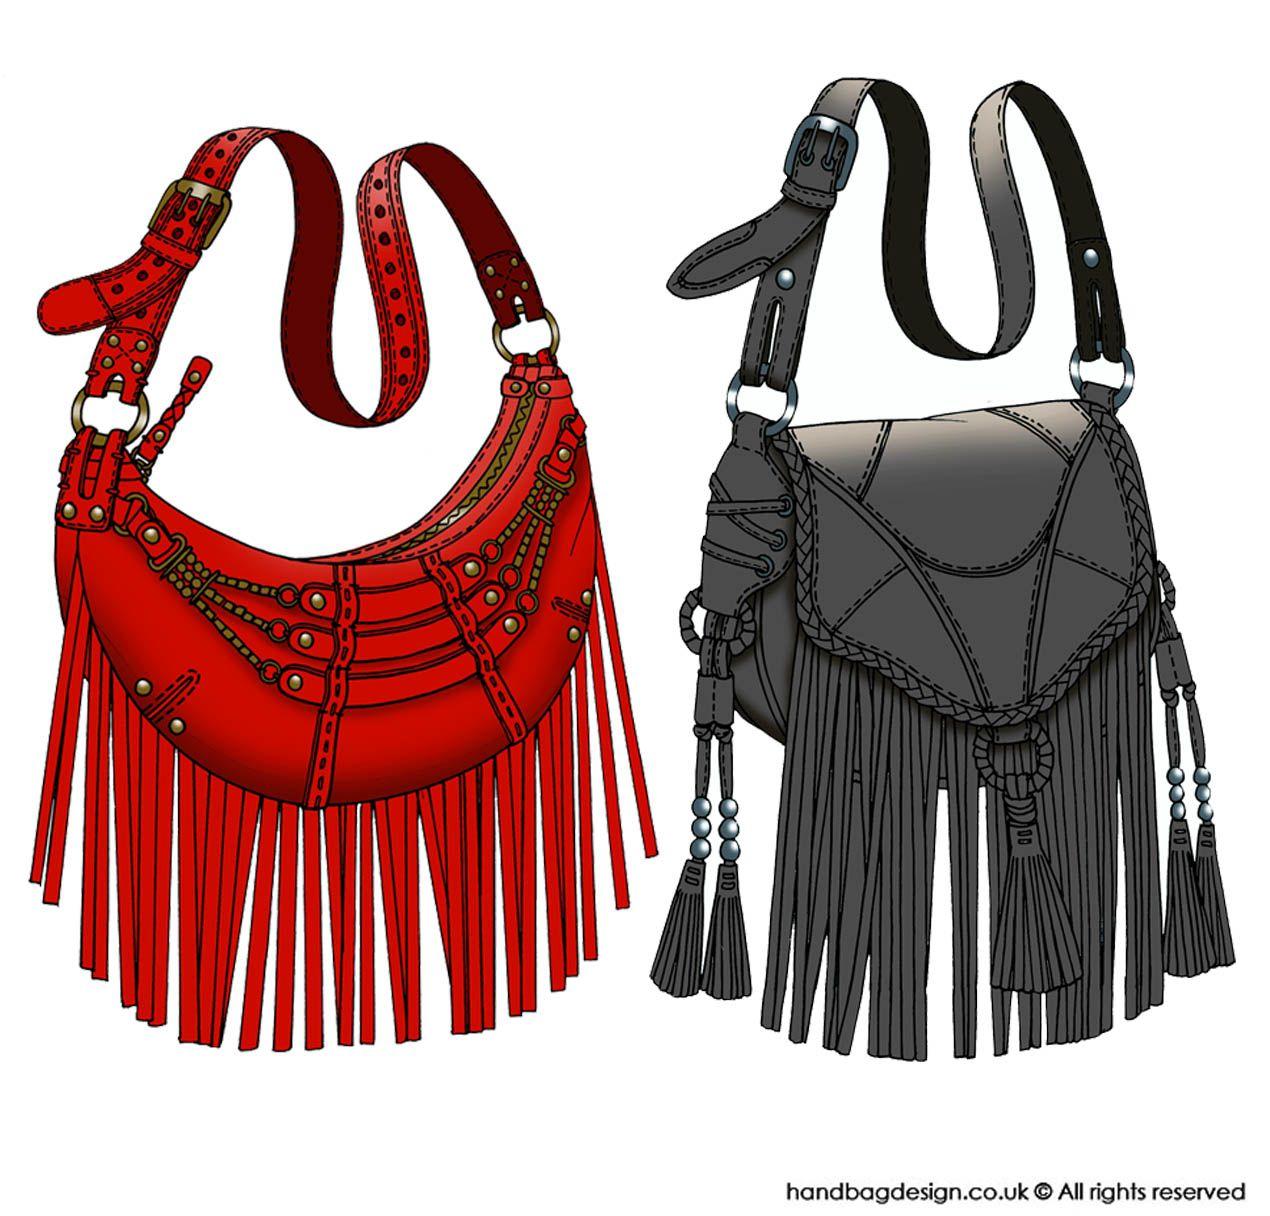 Handbag design Colour Cads / Computer rendering | Art ...